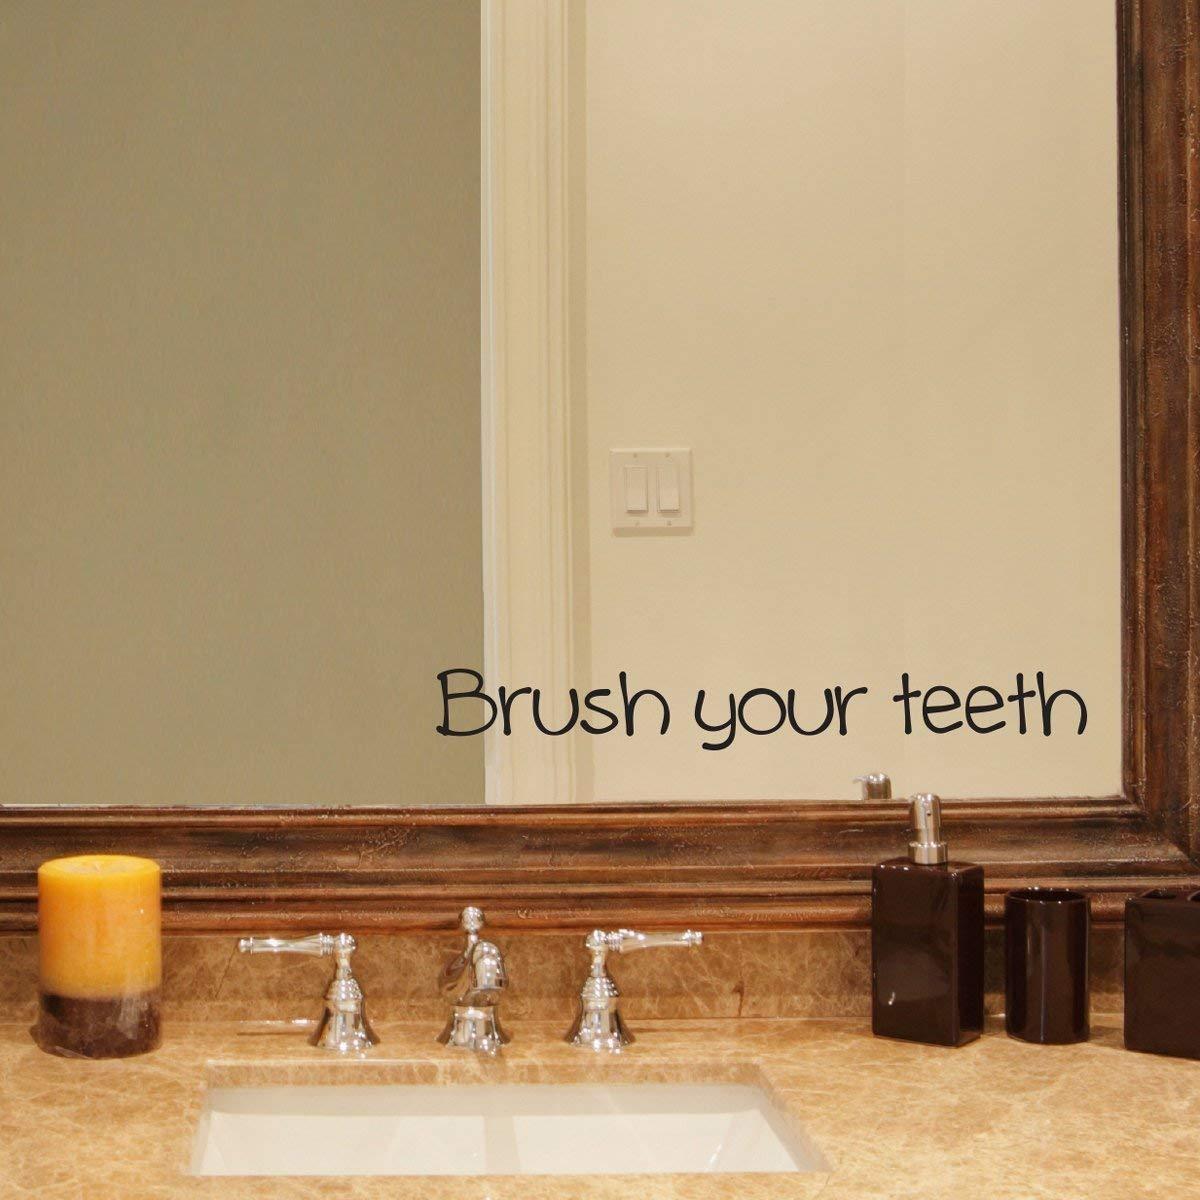 DE0085 Mirror decal Brush your teeth Decal Bathroom decal